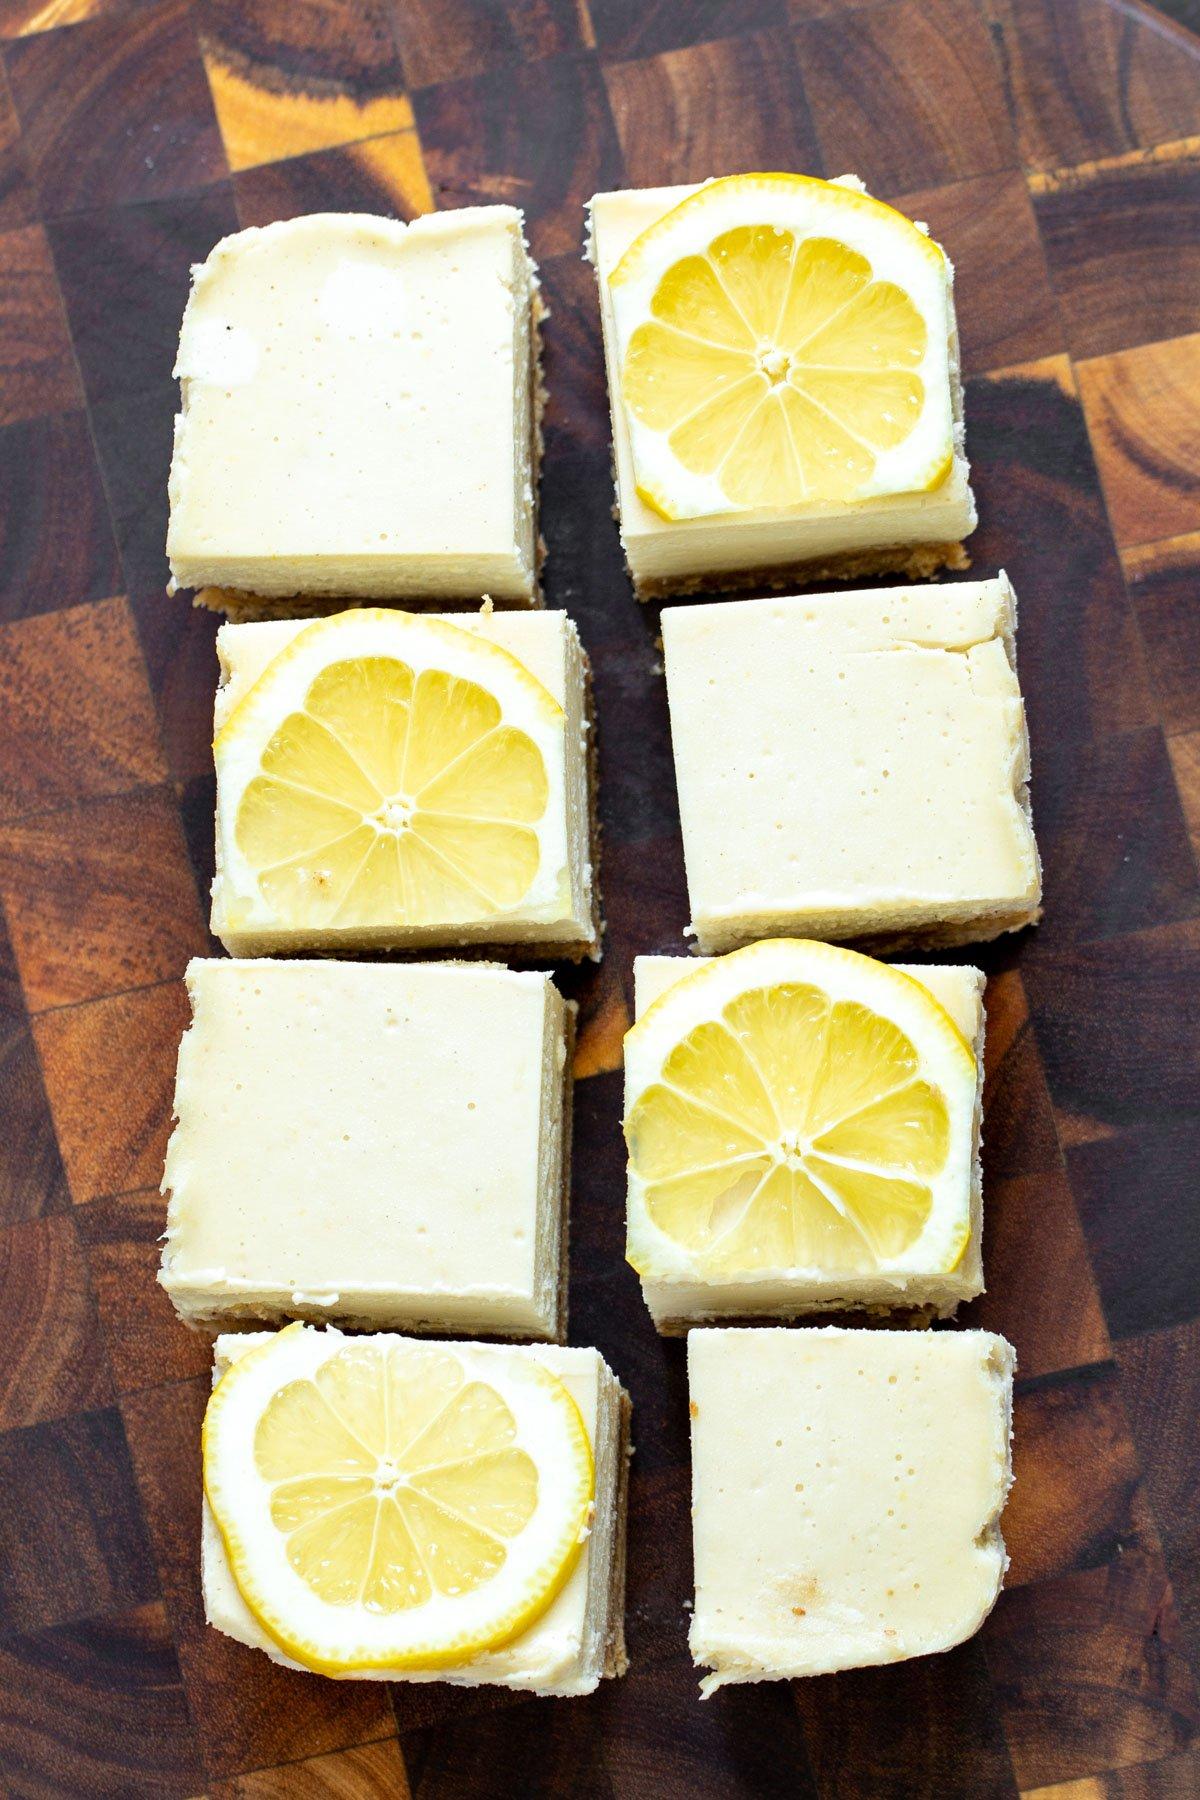 vegan lemon bars on a wooden chopping board topped with lemon slices